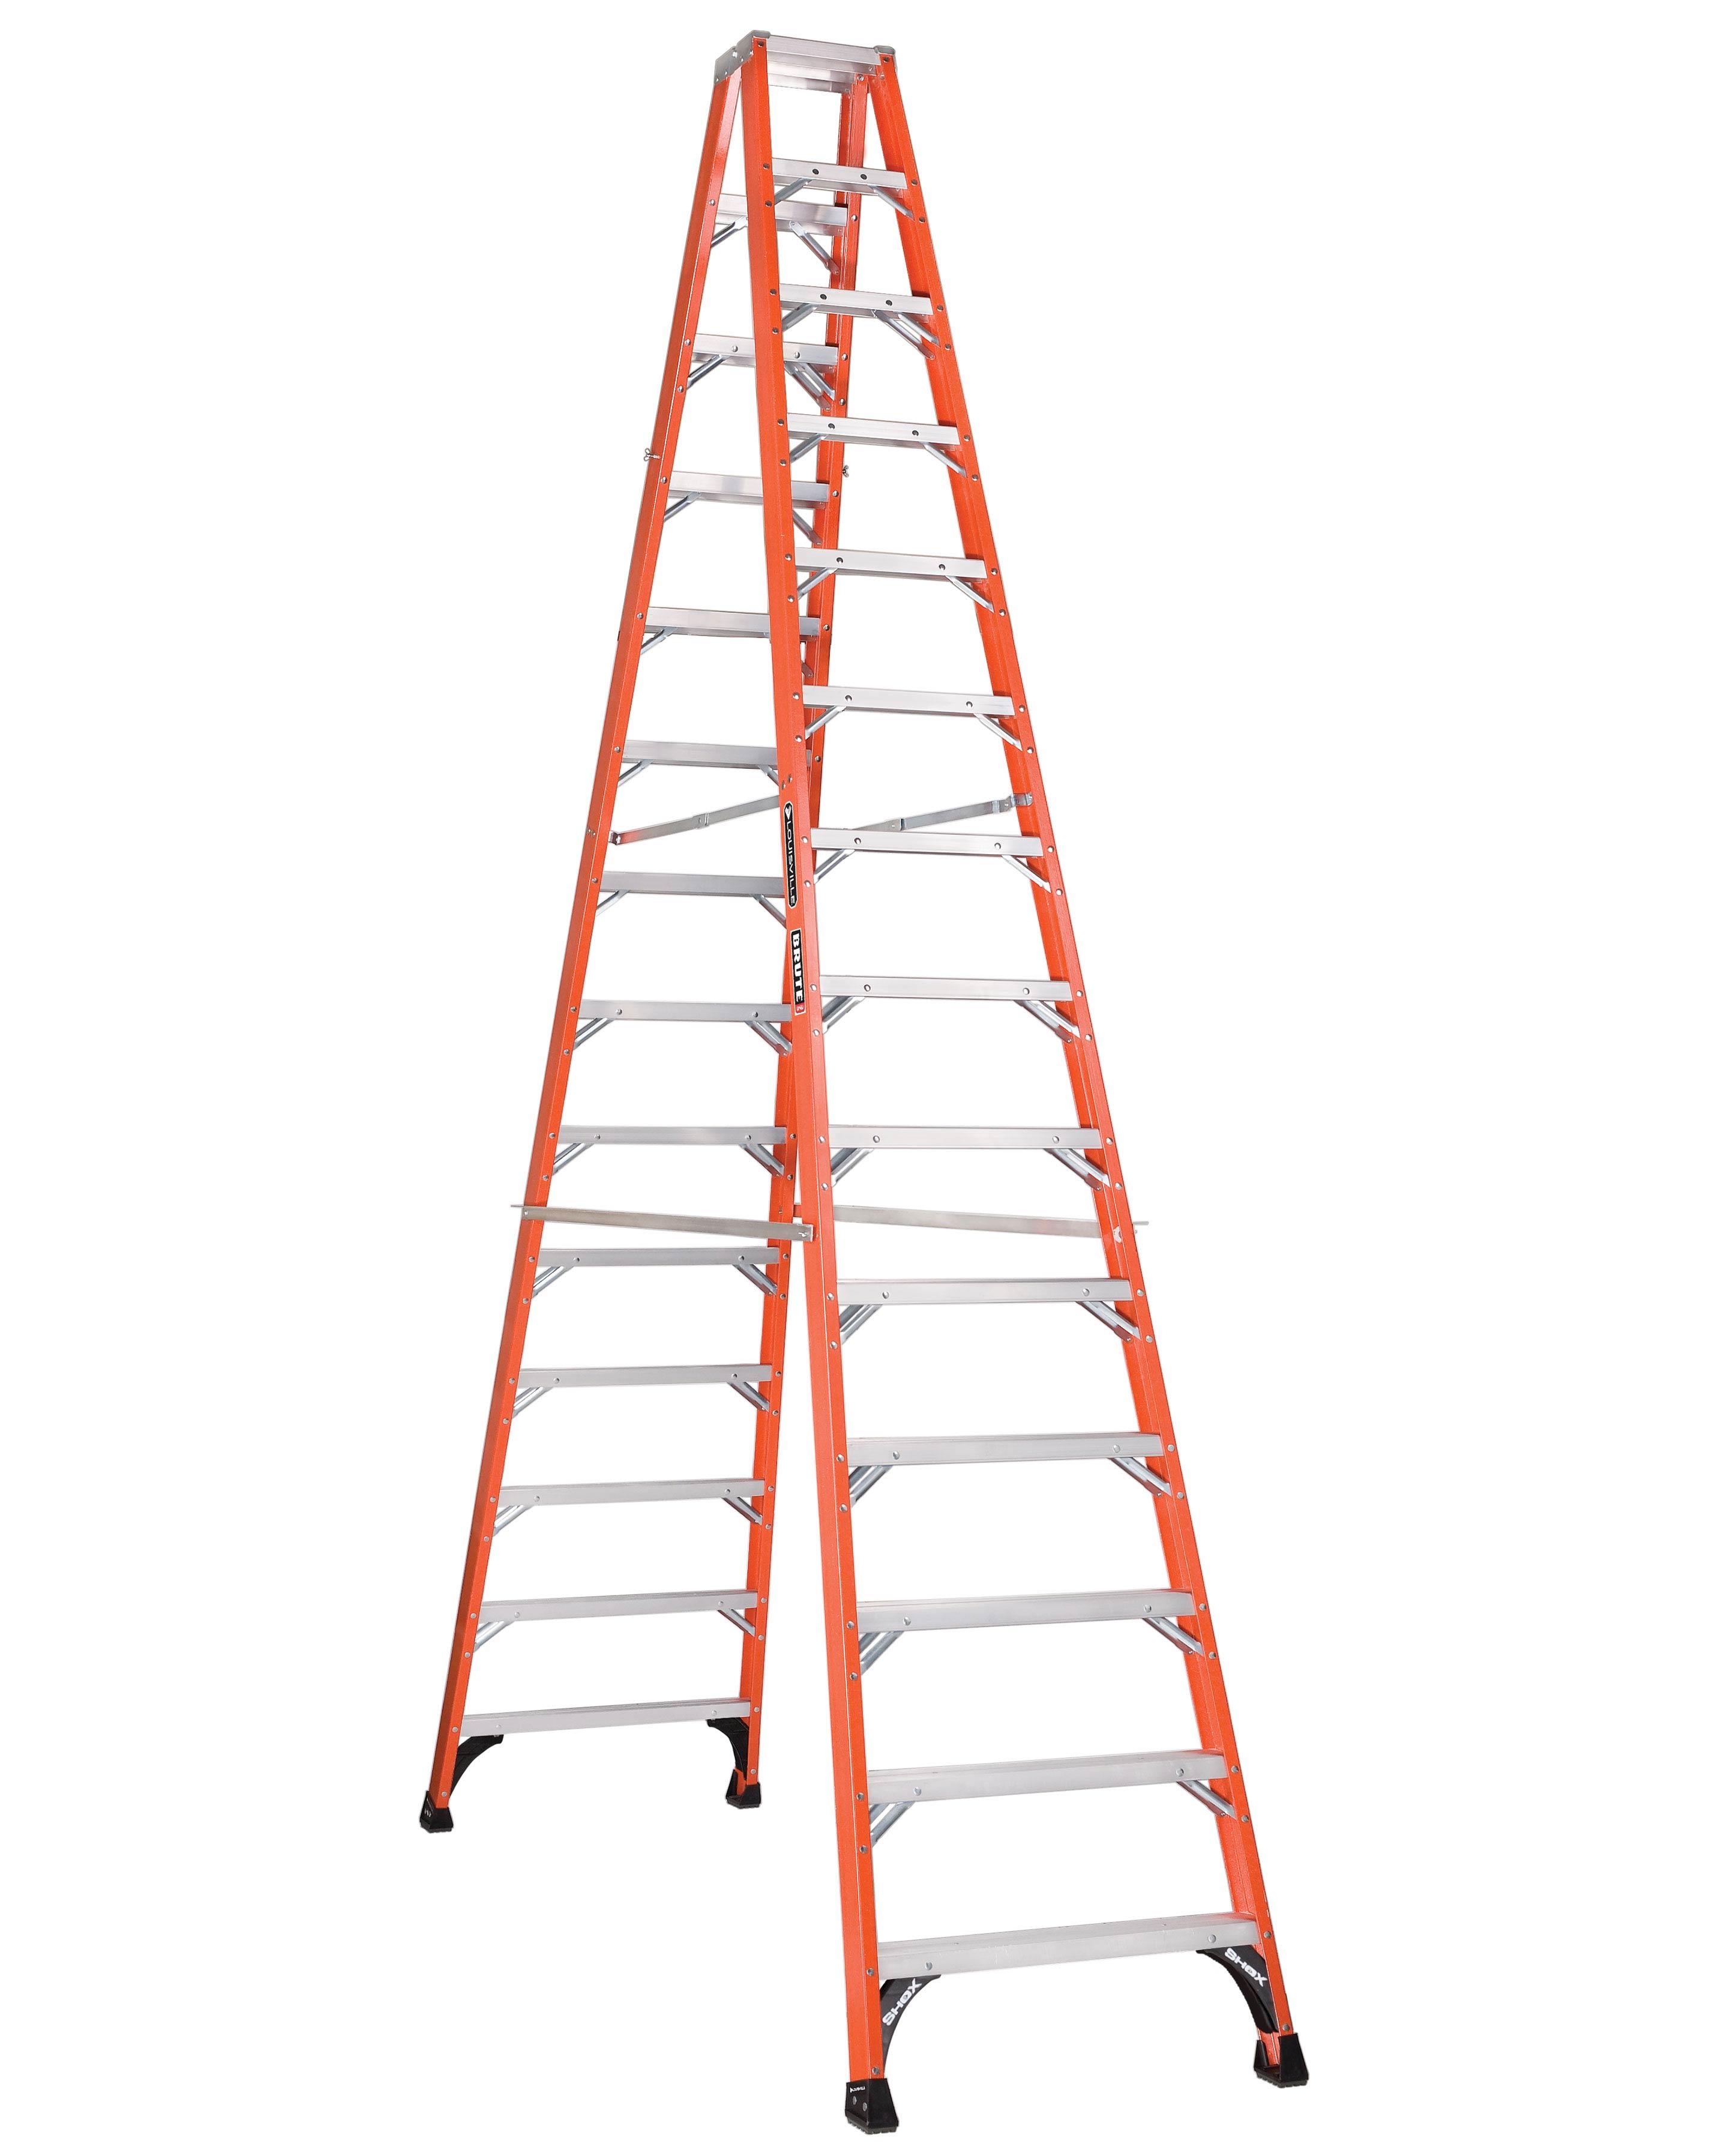 Louisville Ladder FM1414HD 14ft Fiberglass Twin Step Ladder, Type IAA FG, 375lb Load Capacity